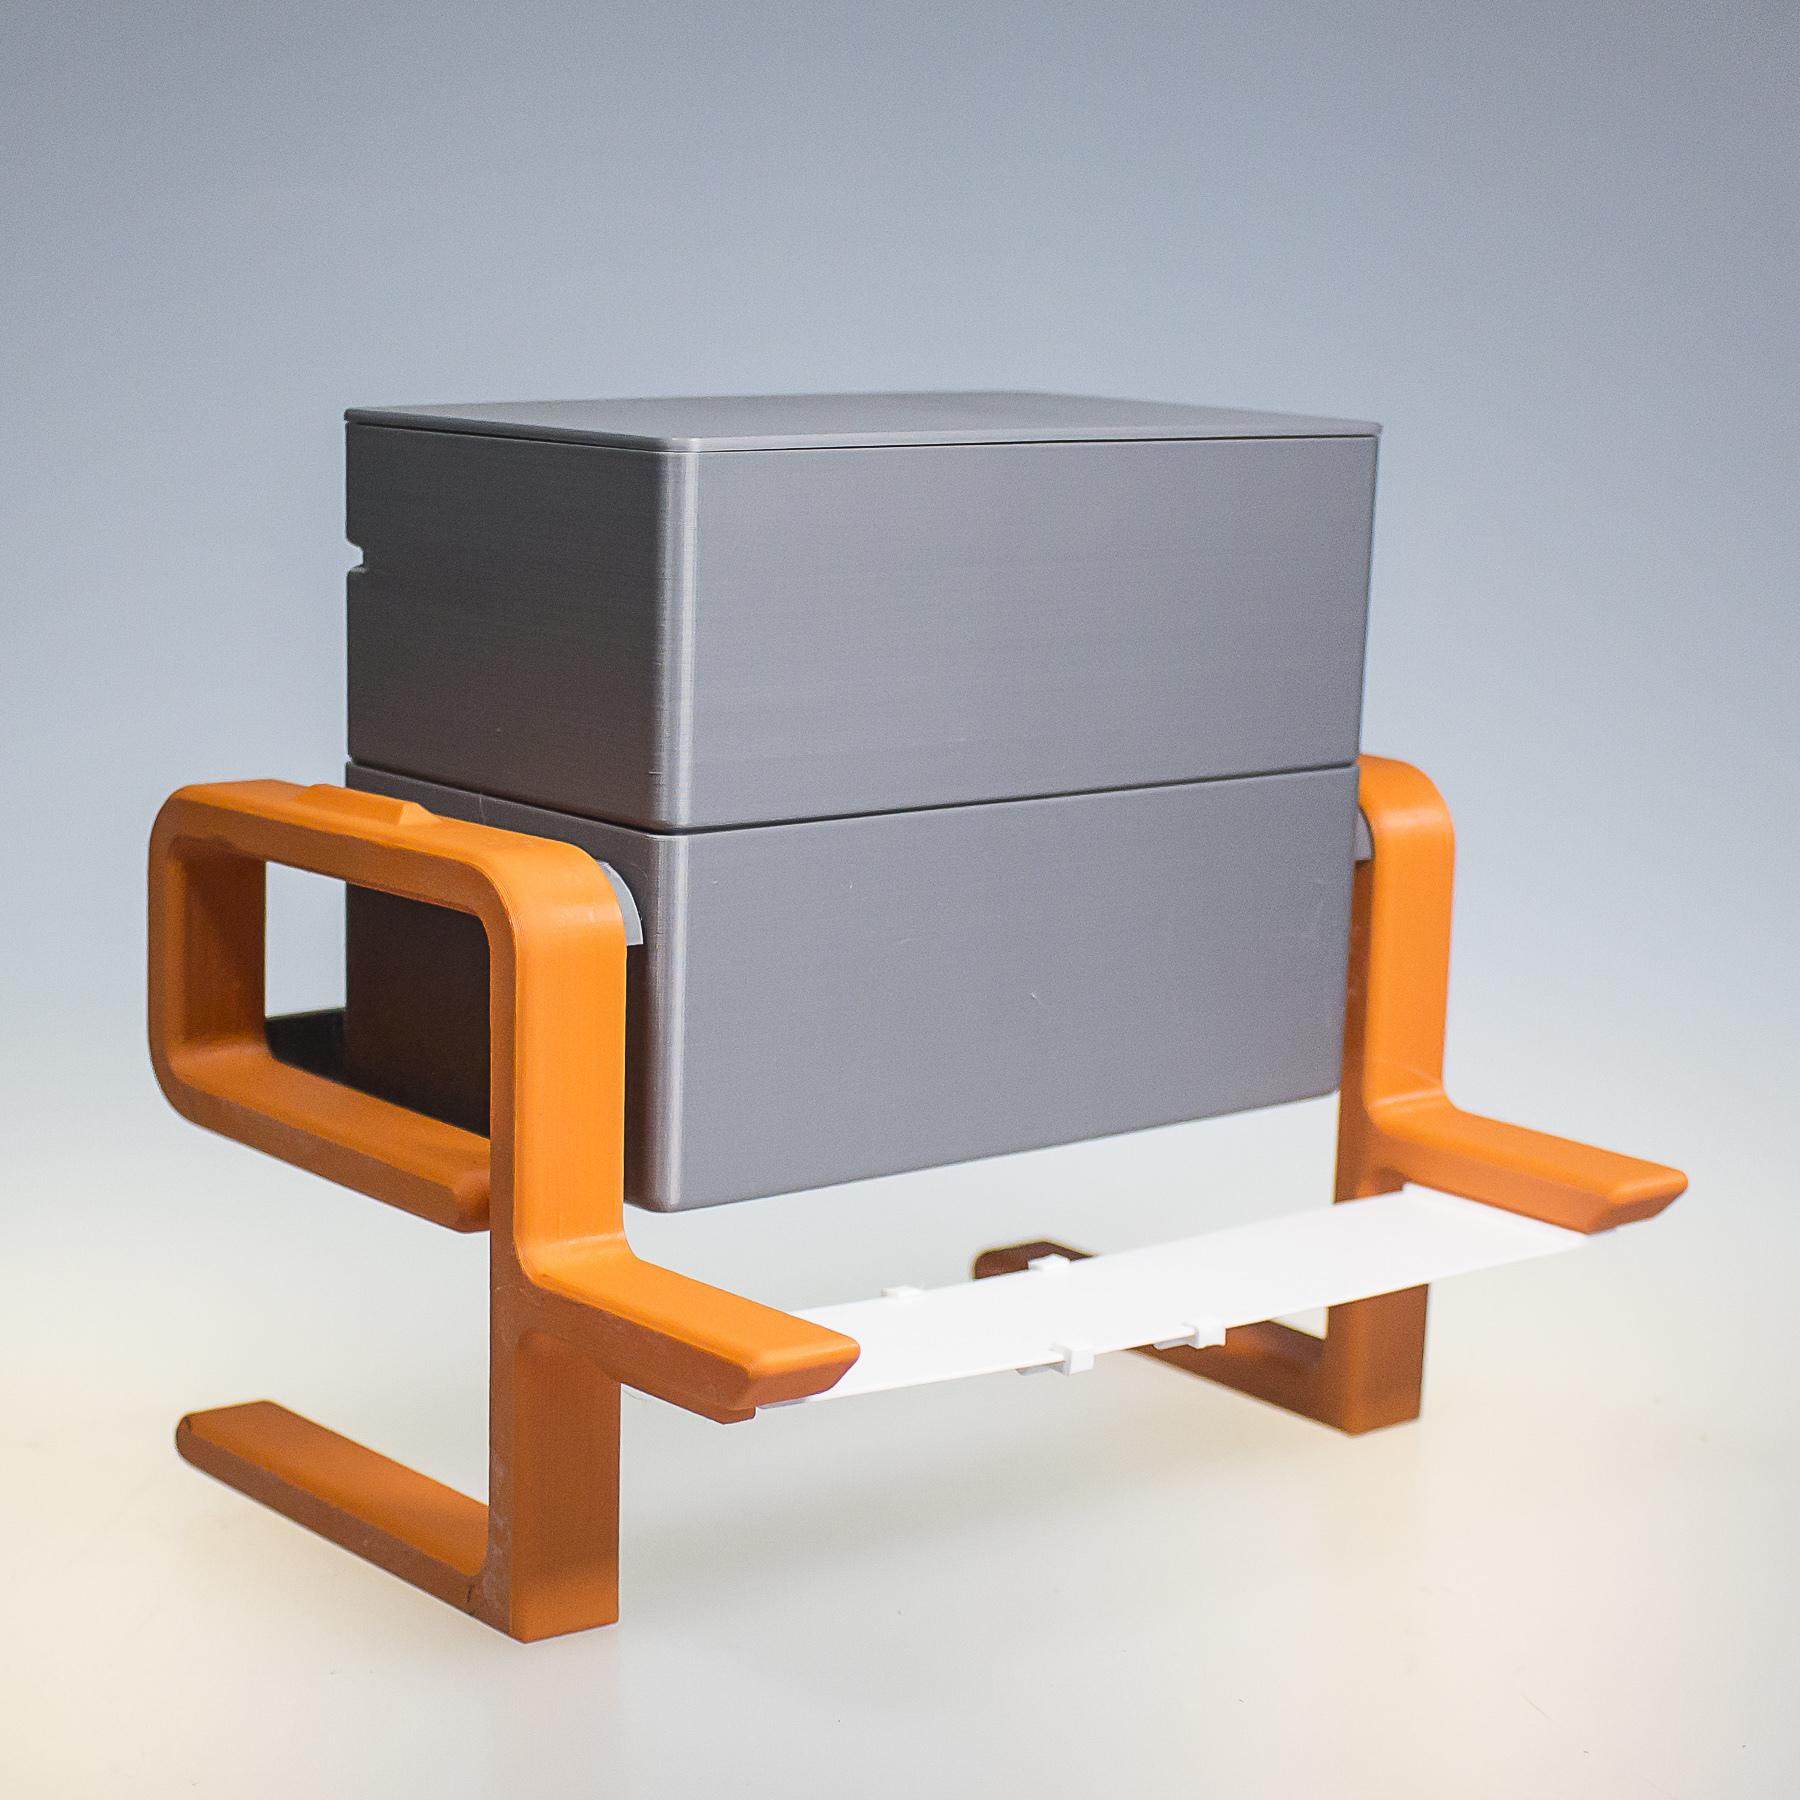 _MG_2002.jpg Download STL file Inkynato • 3D print design, CKLab